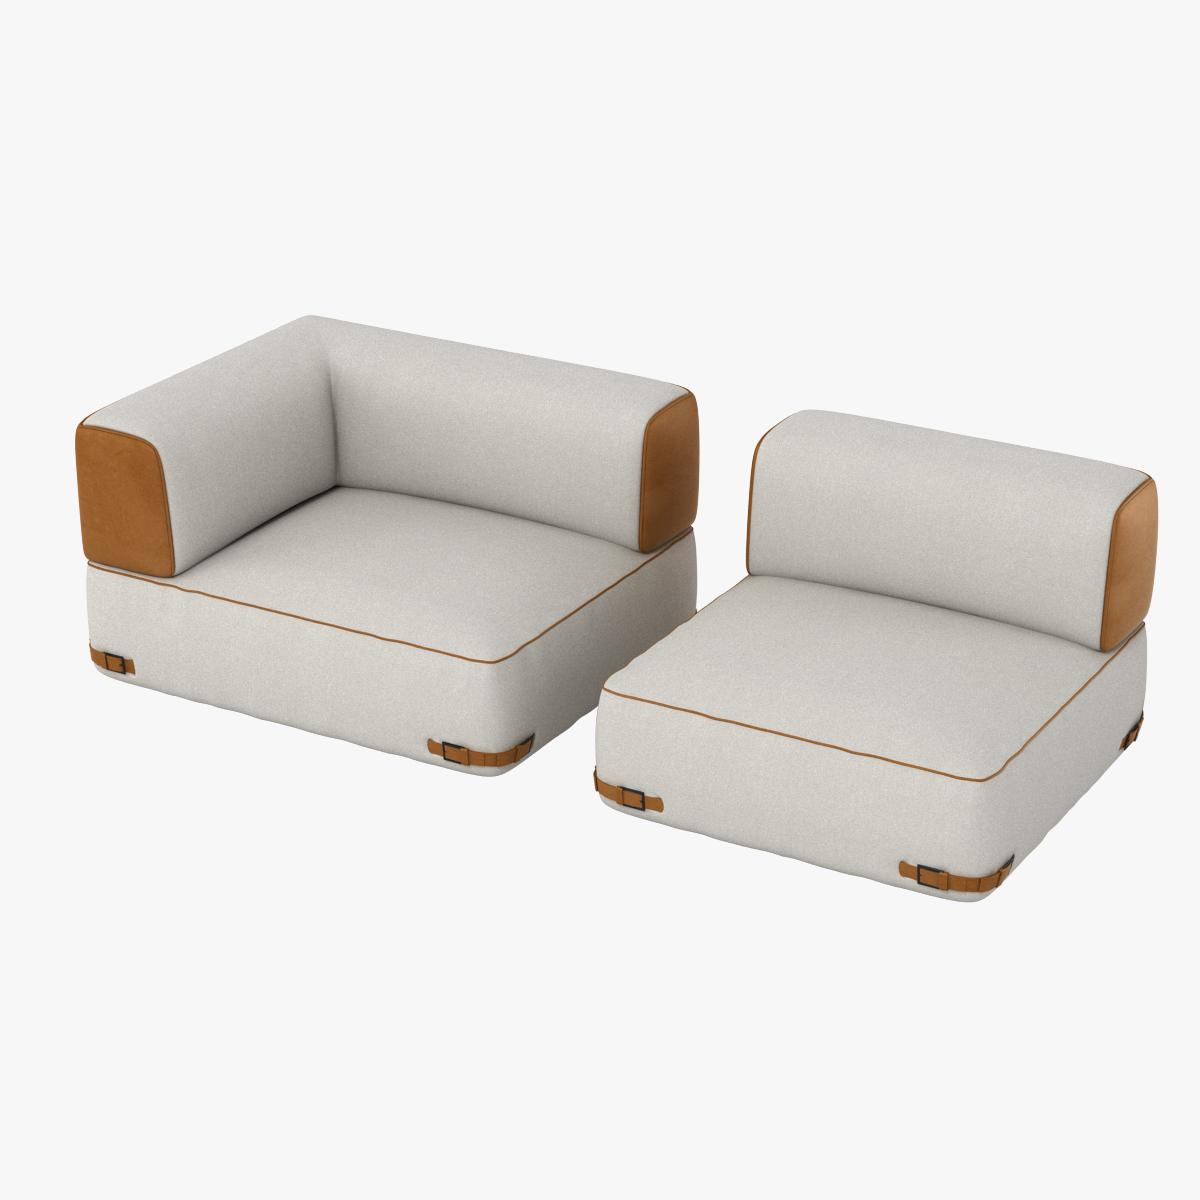 Stupendous Fendi Soho Sofa Set Alphanode Cool Chair Designs And Ideas Alphanodeonline